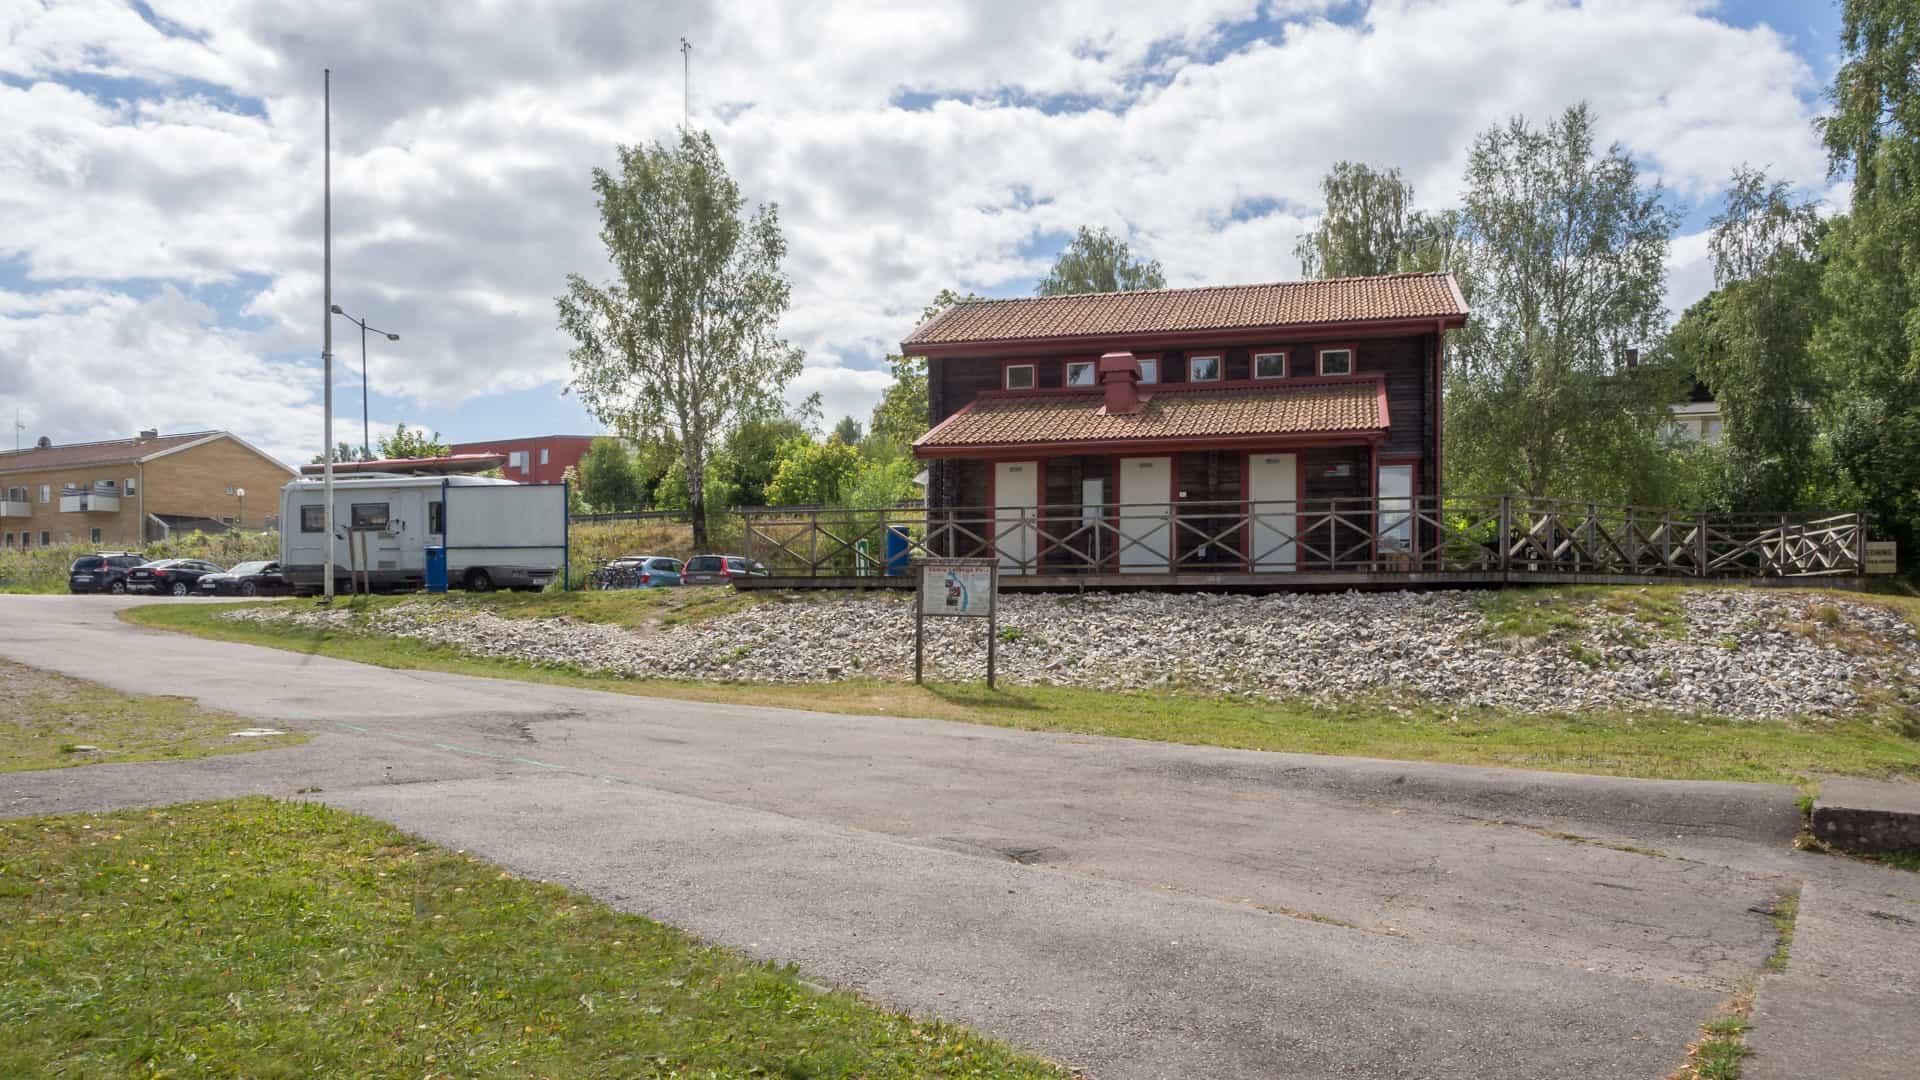 Touristeninfo in Bengtsfors